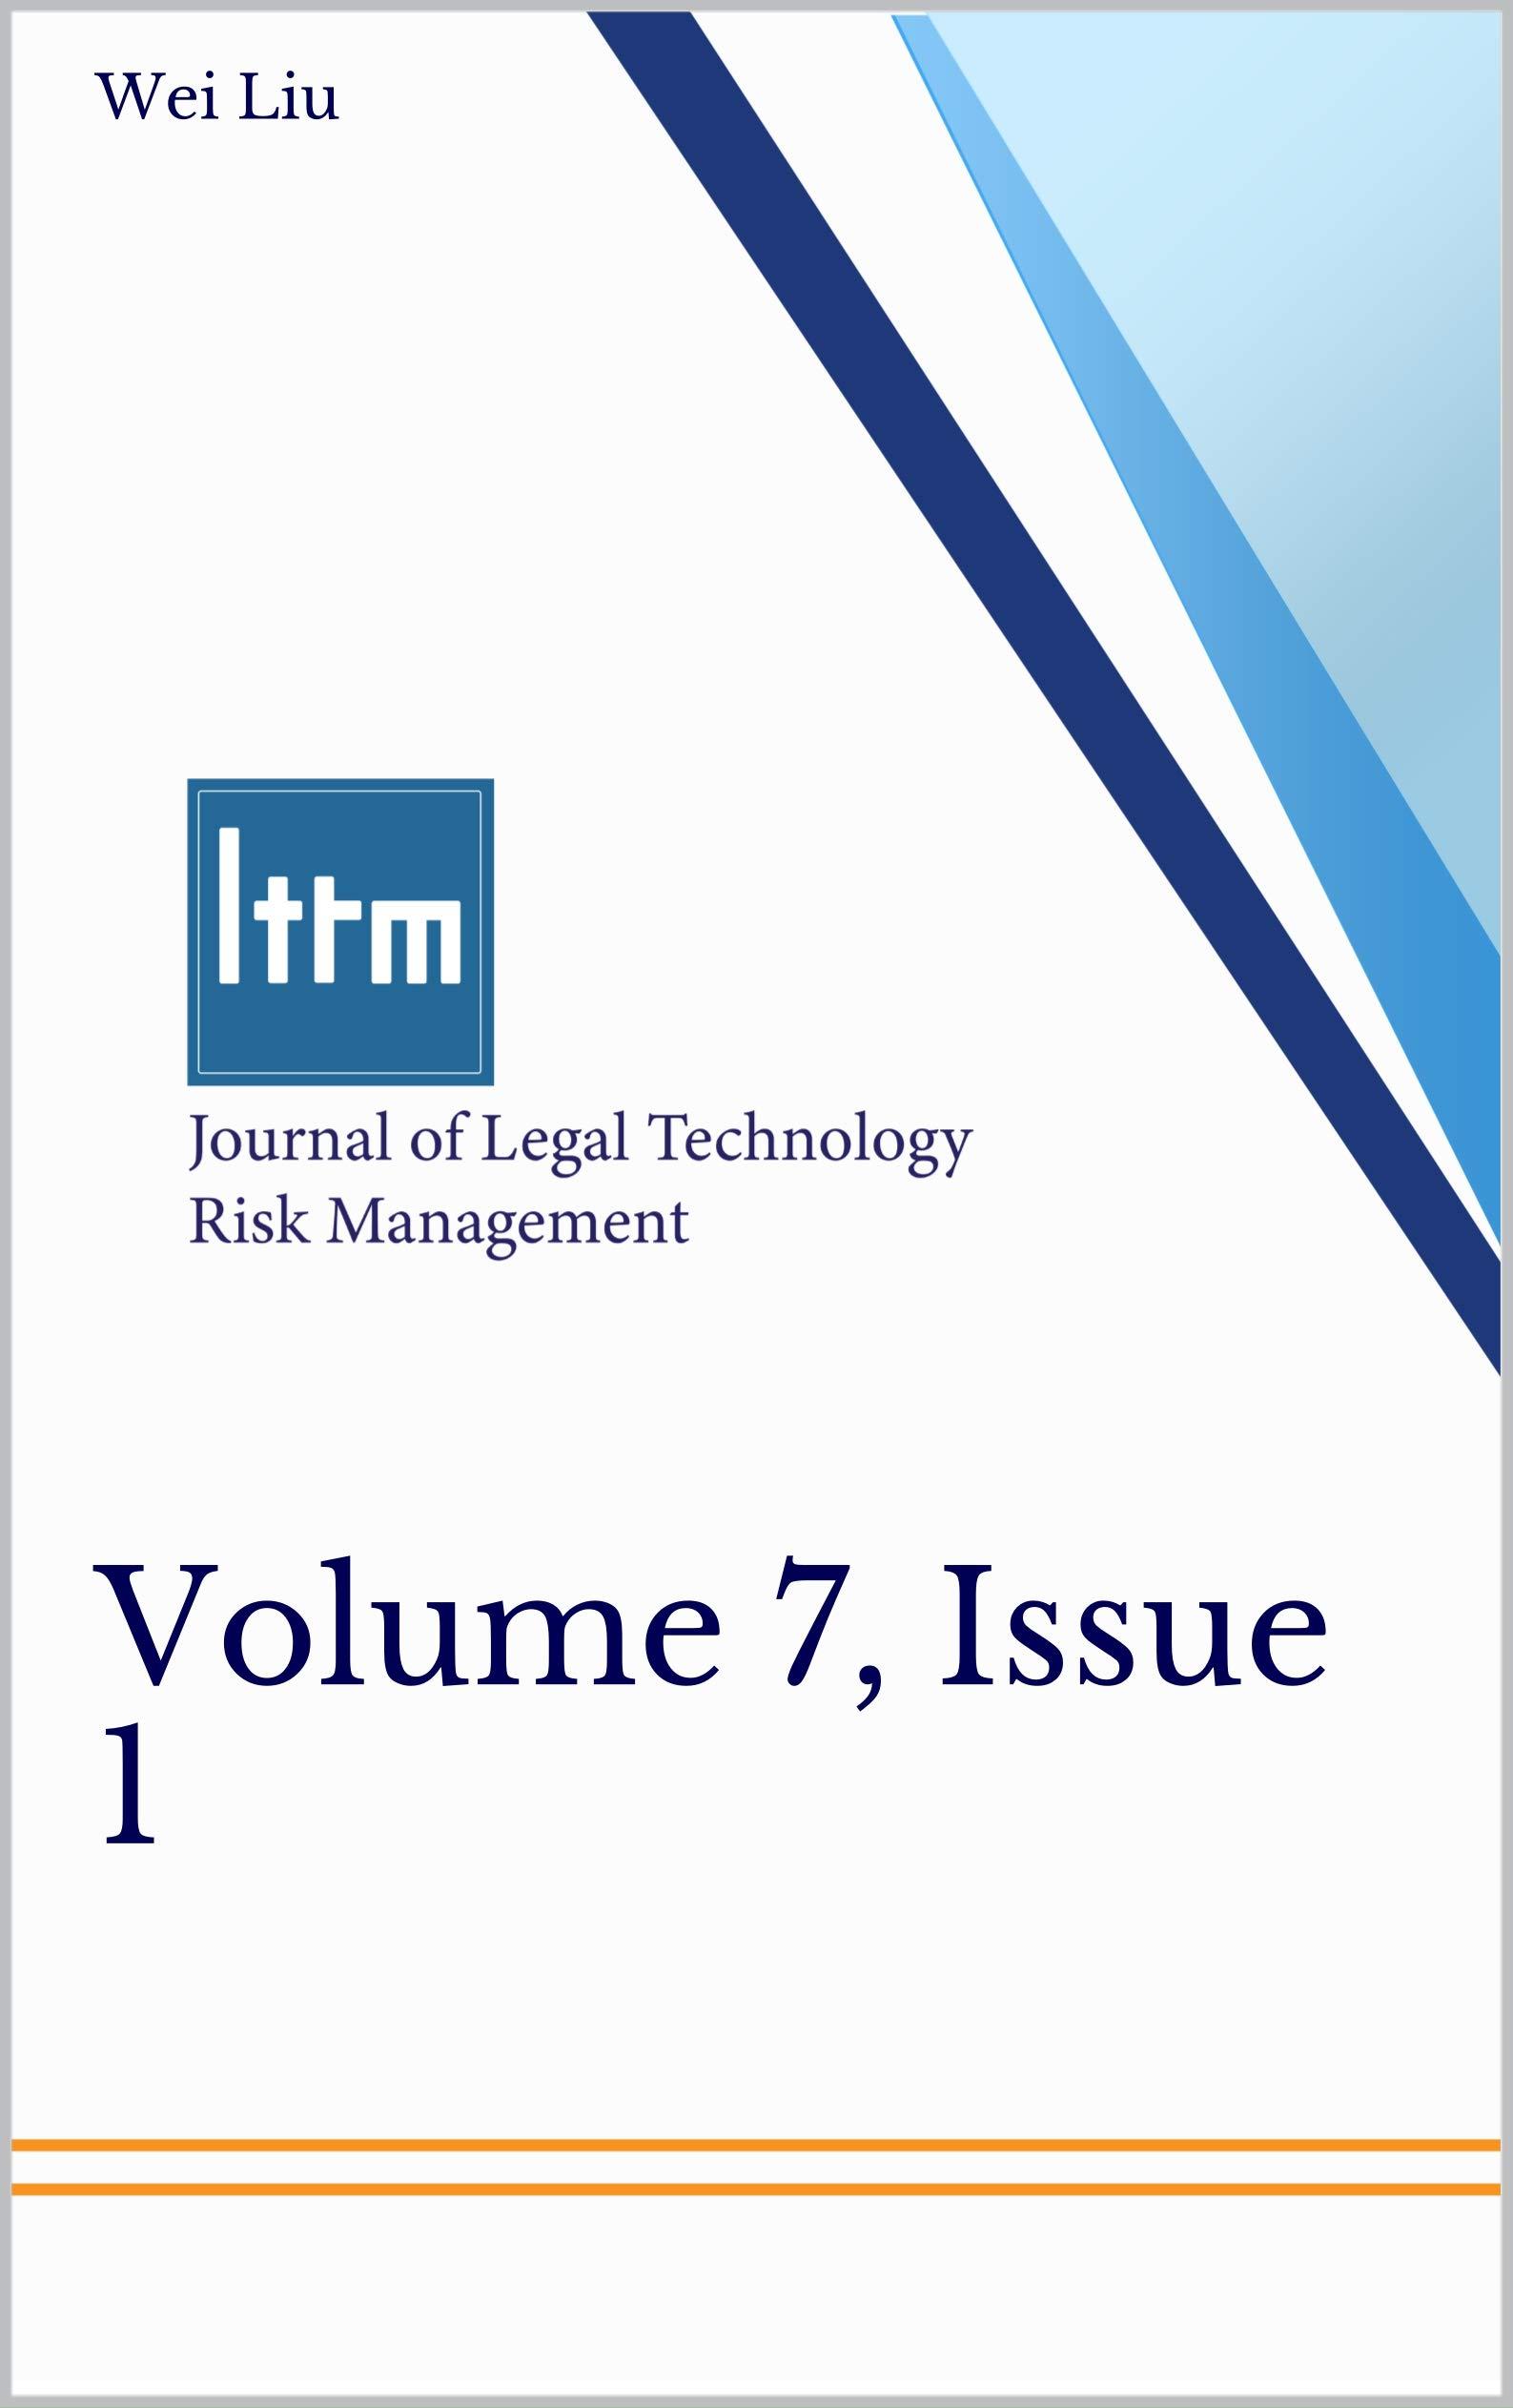 Journal of Legal Technology Risk Management, Volume 7, Issue 1